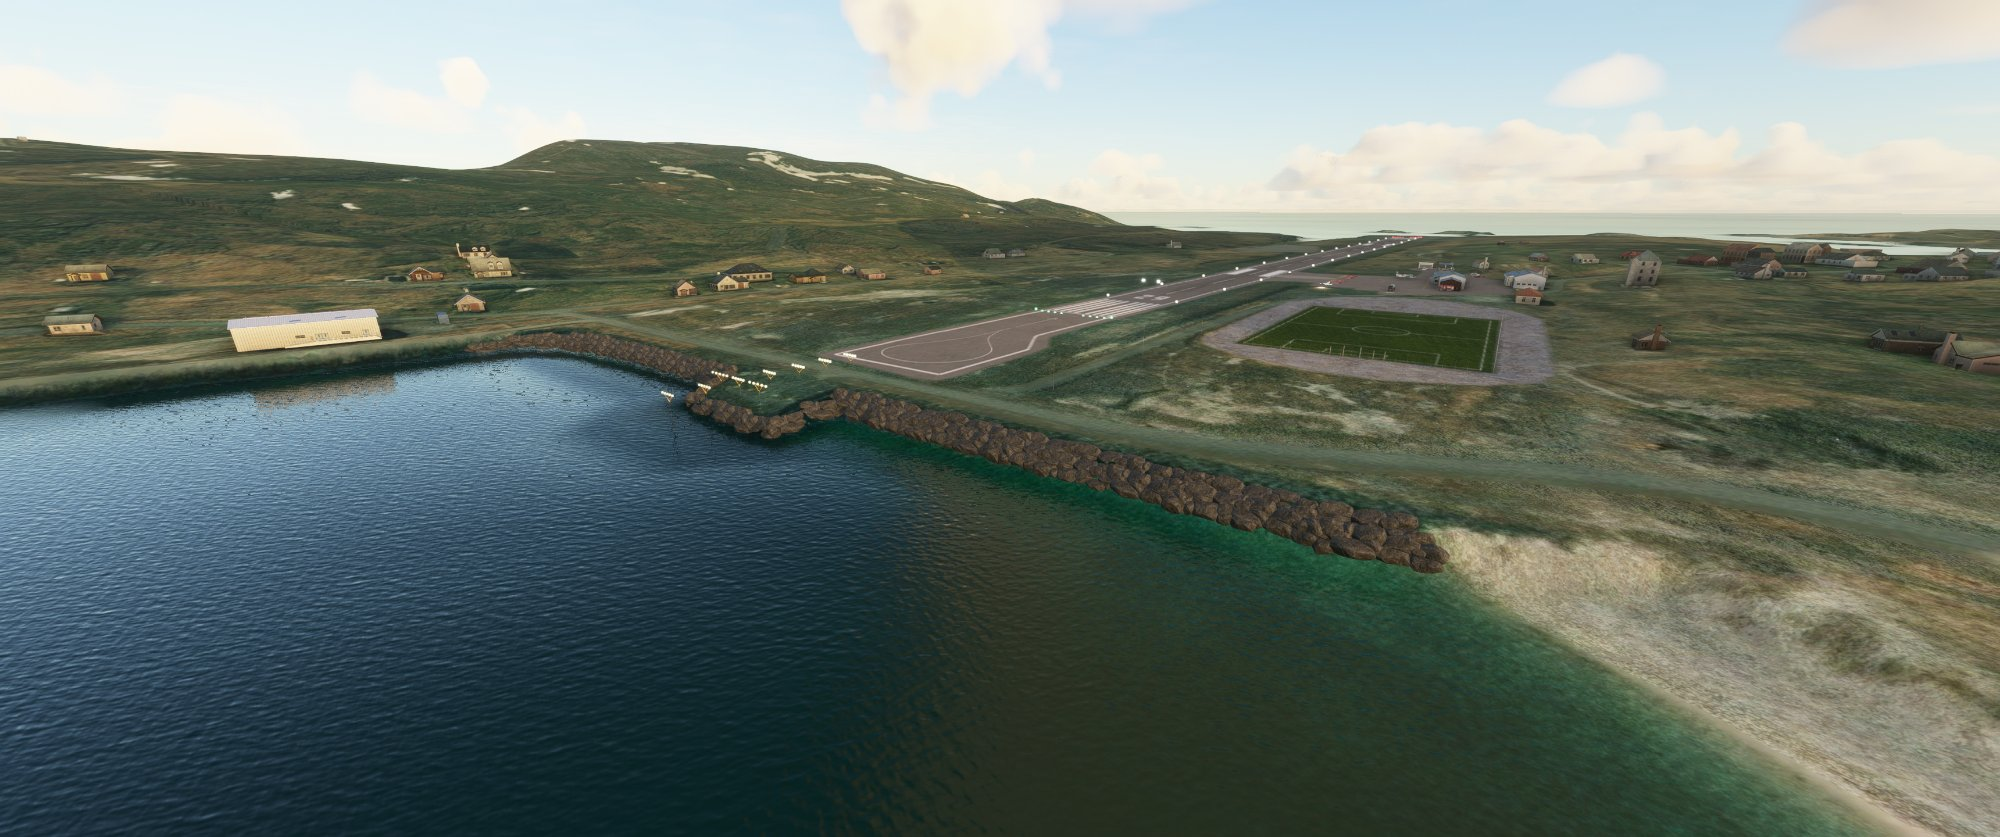 Microsoft Flight Simulator Screenshot 2020.11.19 - 15.44.34.68.jpg